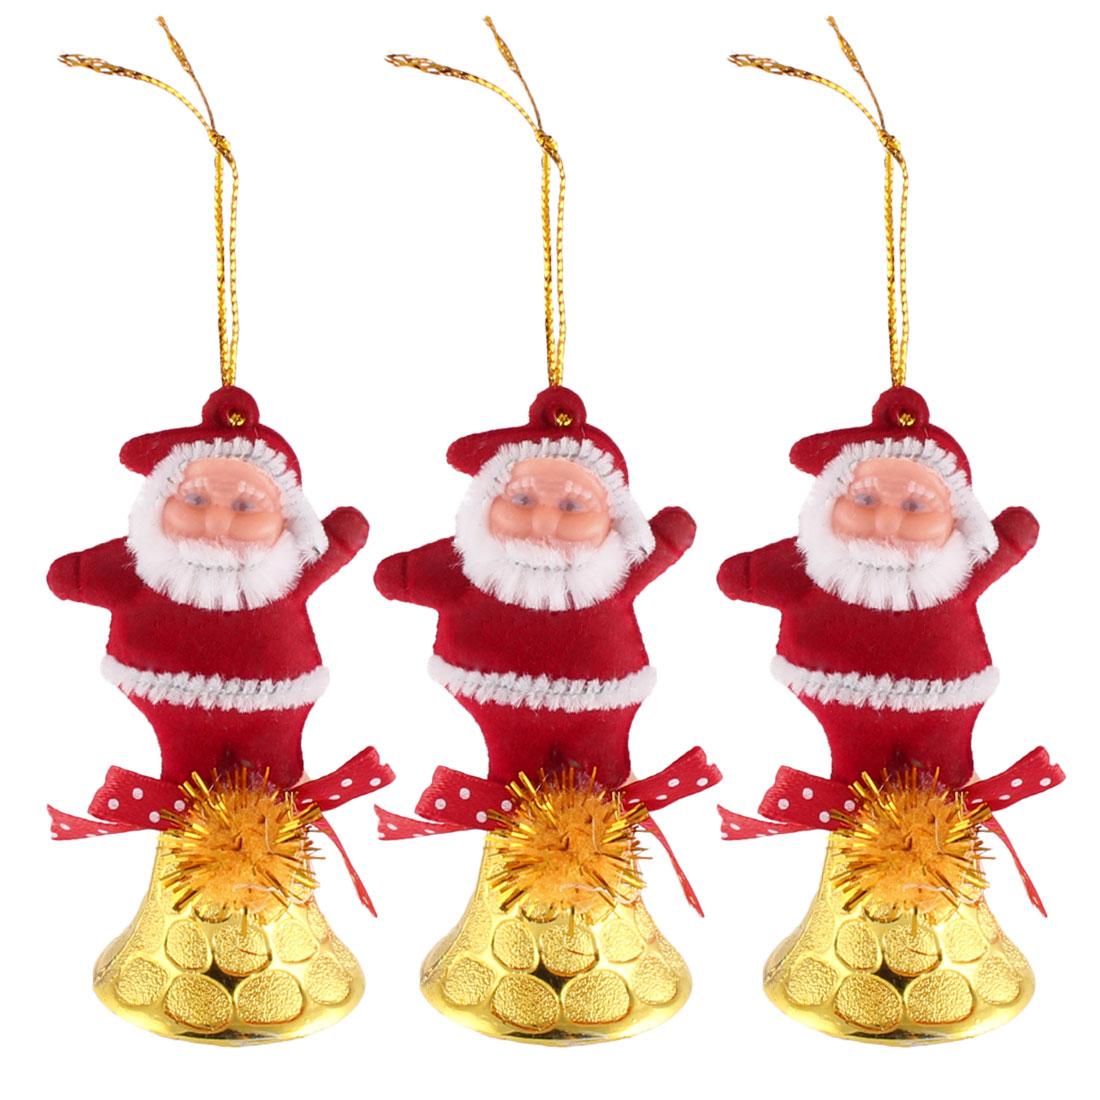 Xmas Christmas Tree Santa Claus Hanging Decor Festive Bell Ornament 3 PCS